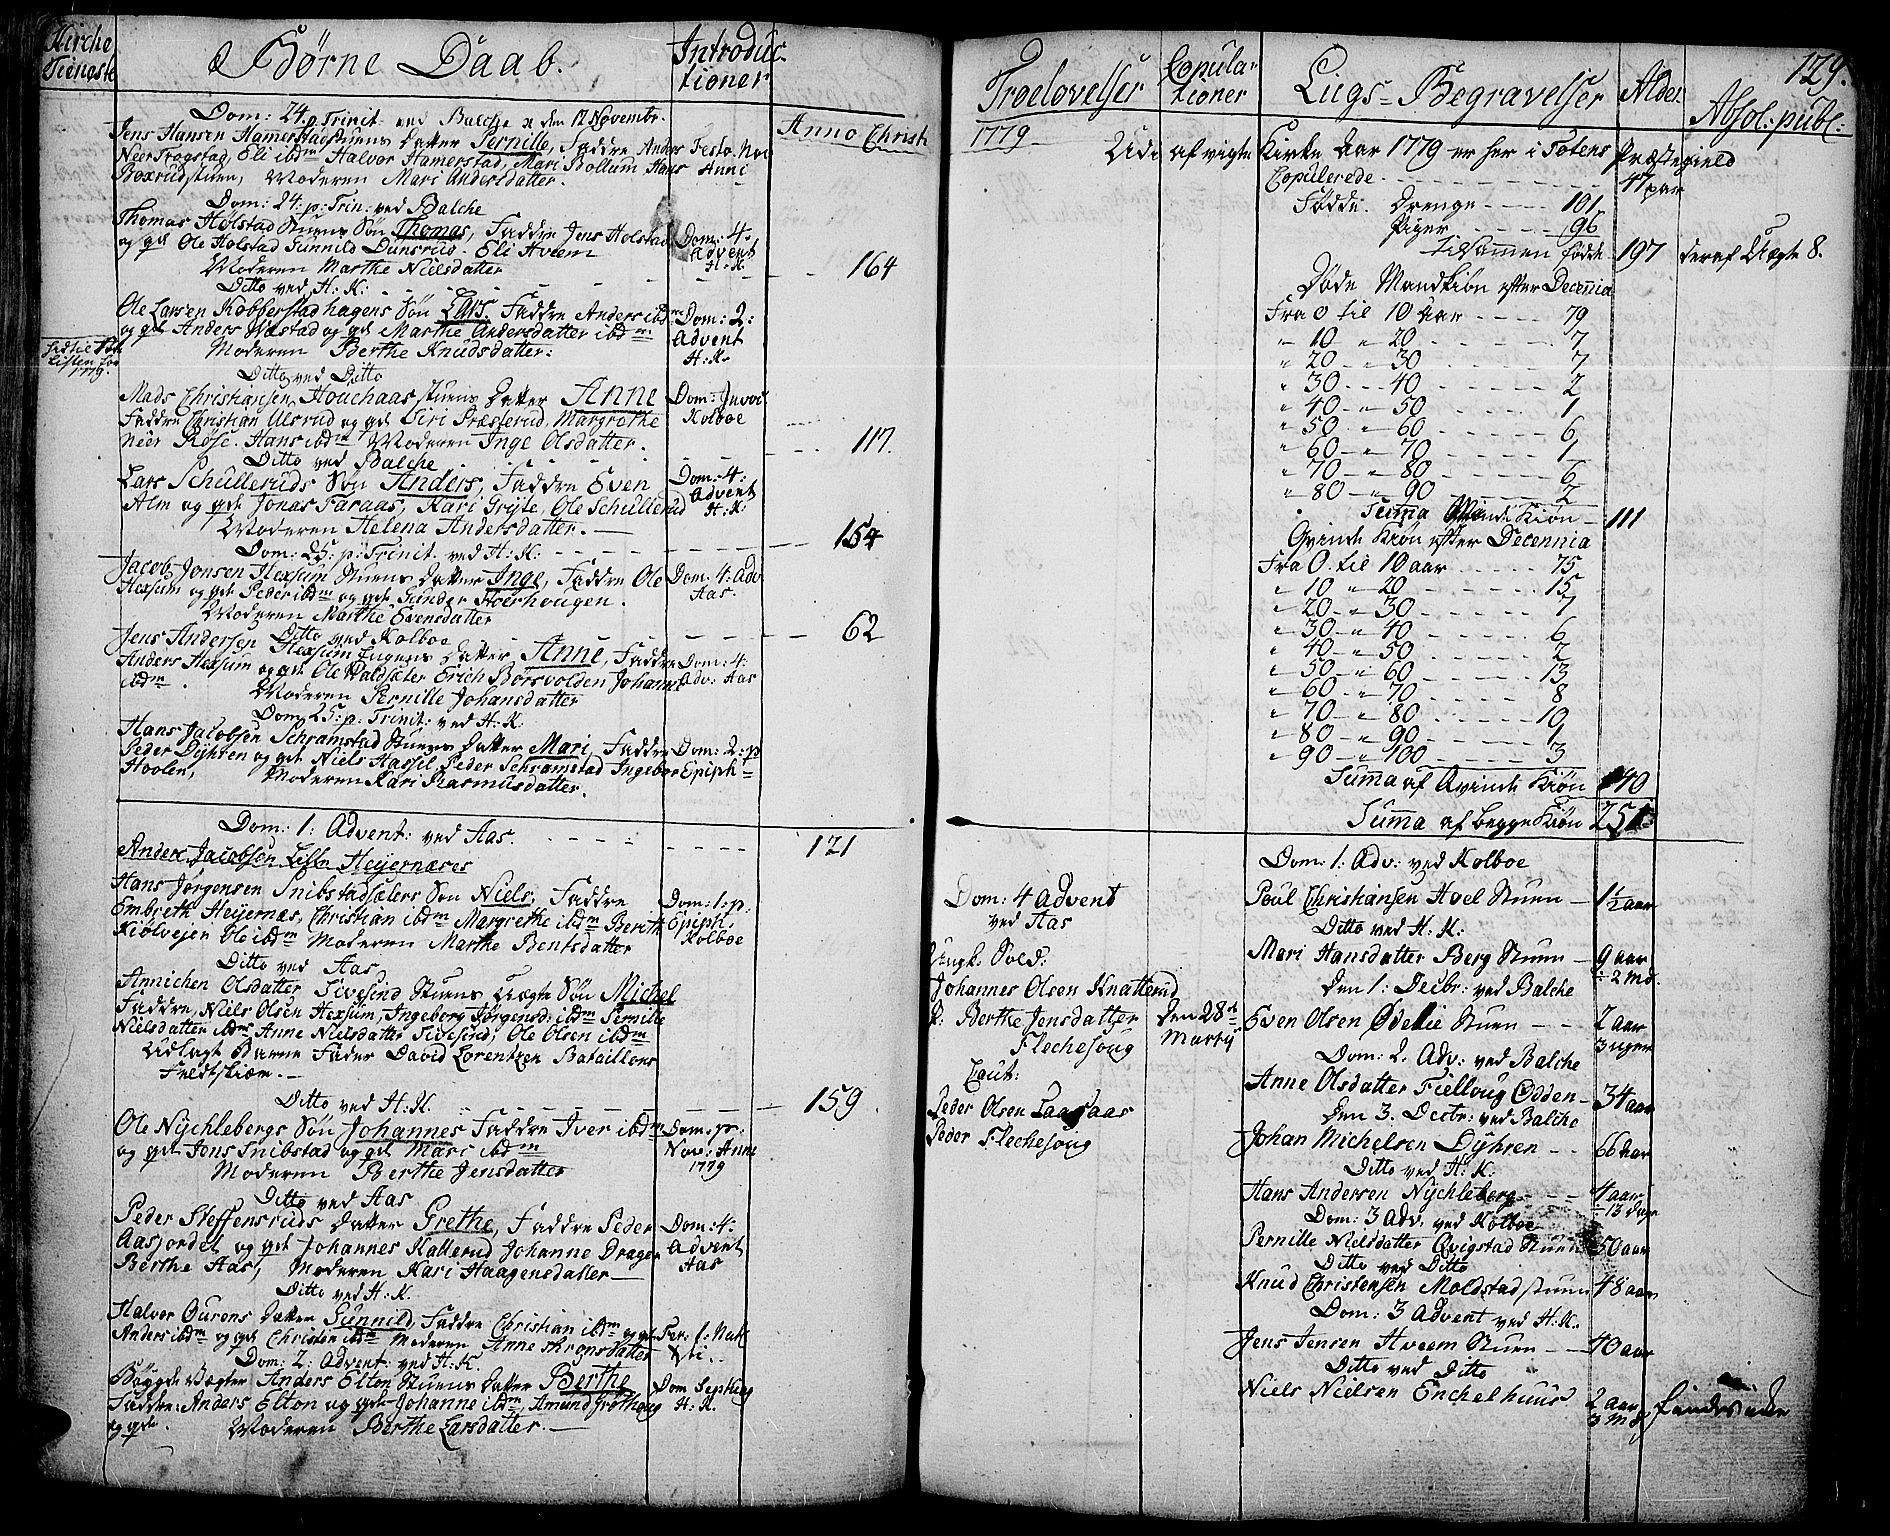 SAH, Toten prestekontor, Ministerialbok nr. 6, 1773-1793, s. 129